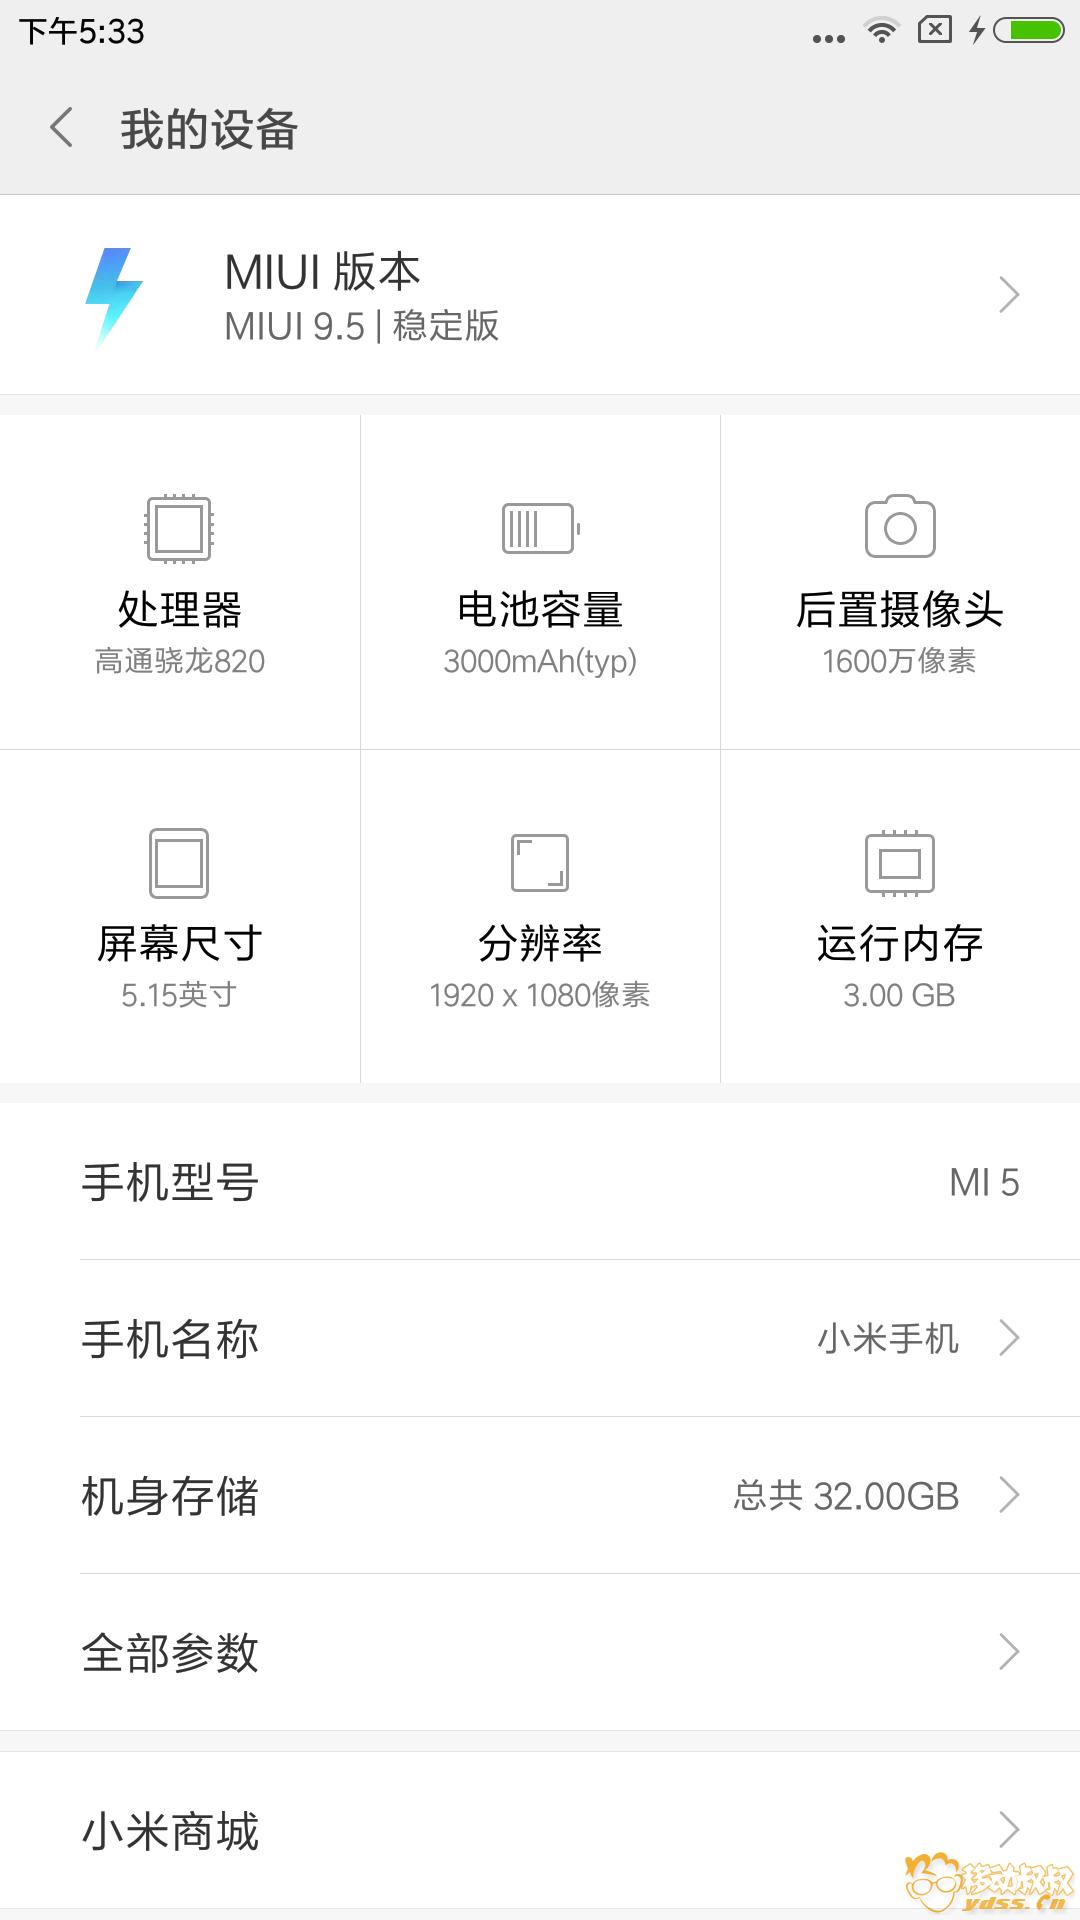 Screenshot_2018-03-17-17-33-32-188_com.android.settings.png